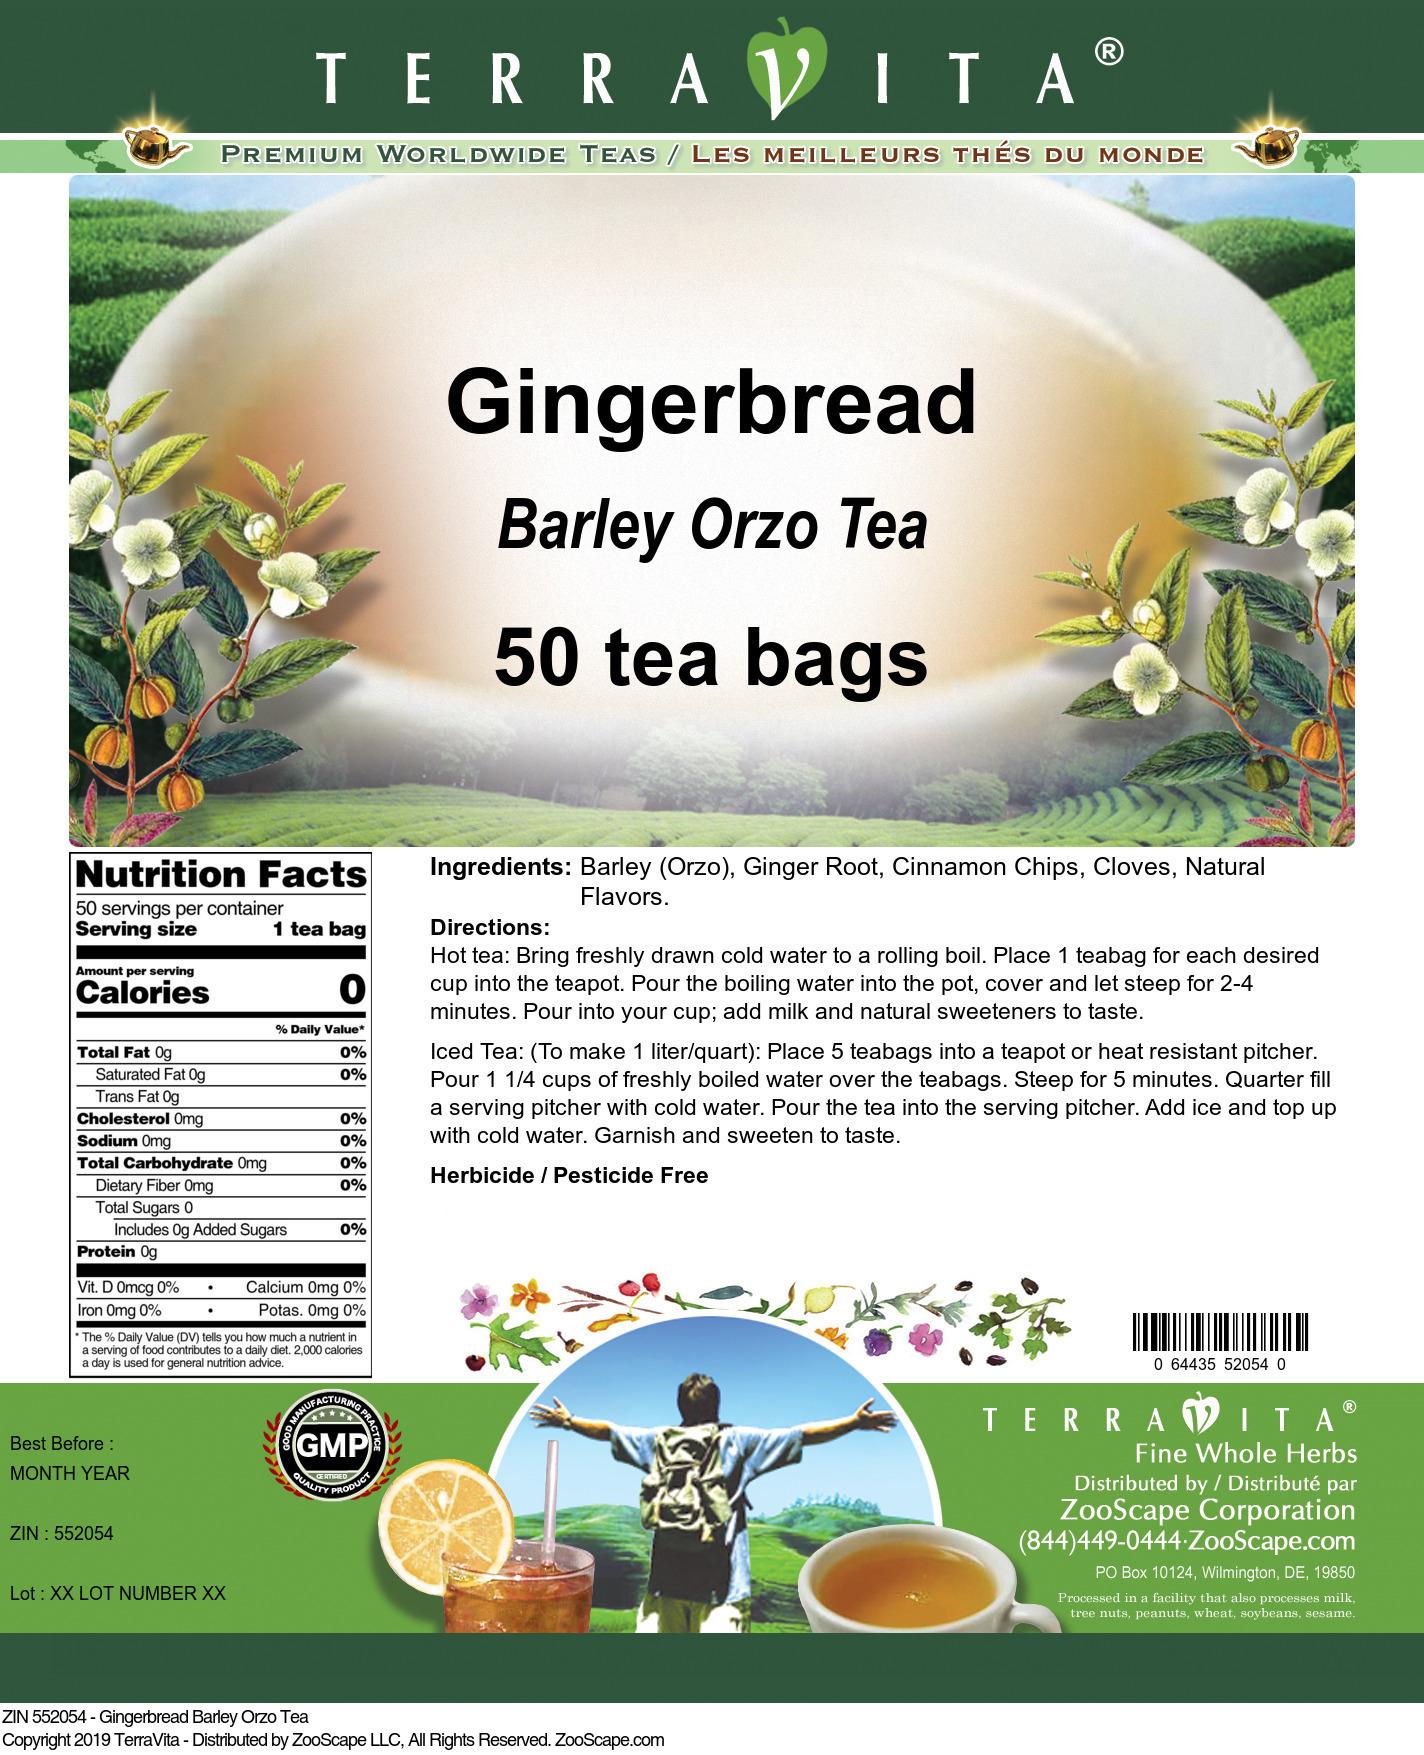 Gingerbread Barley Orzo